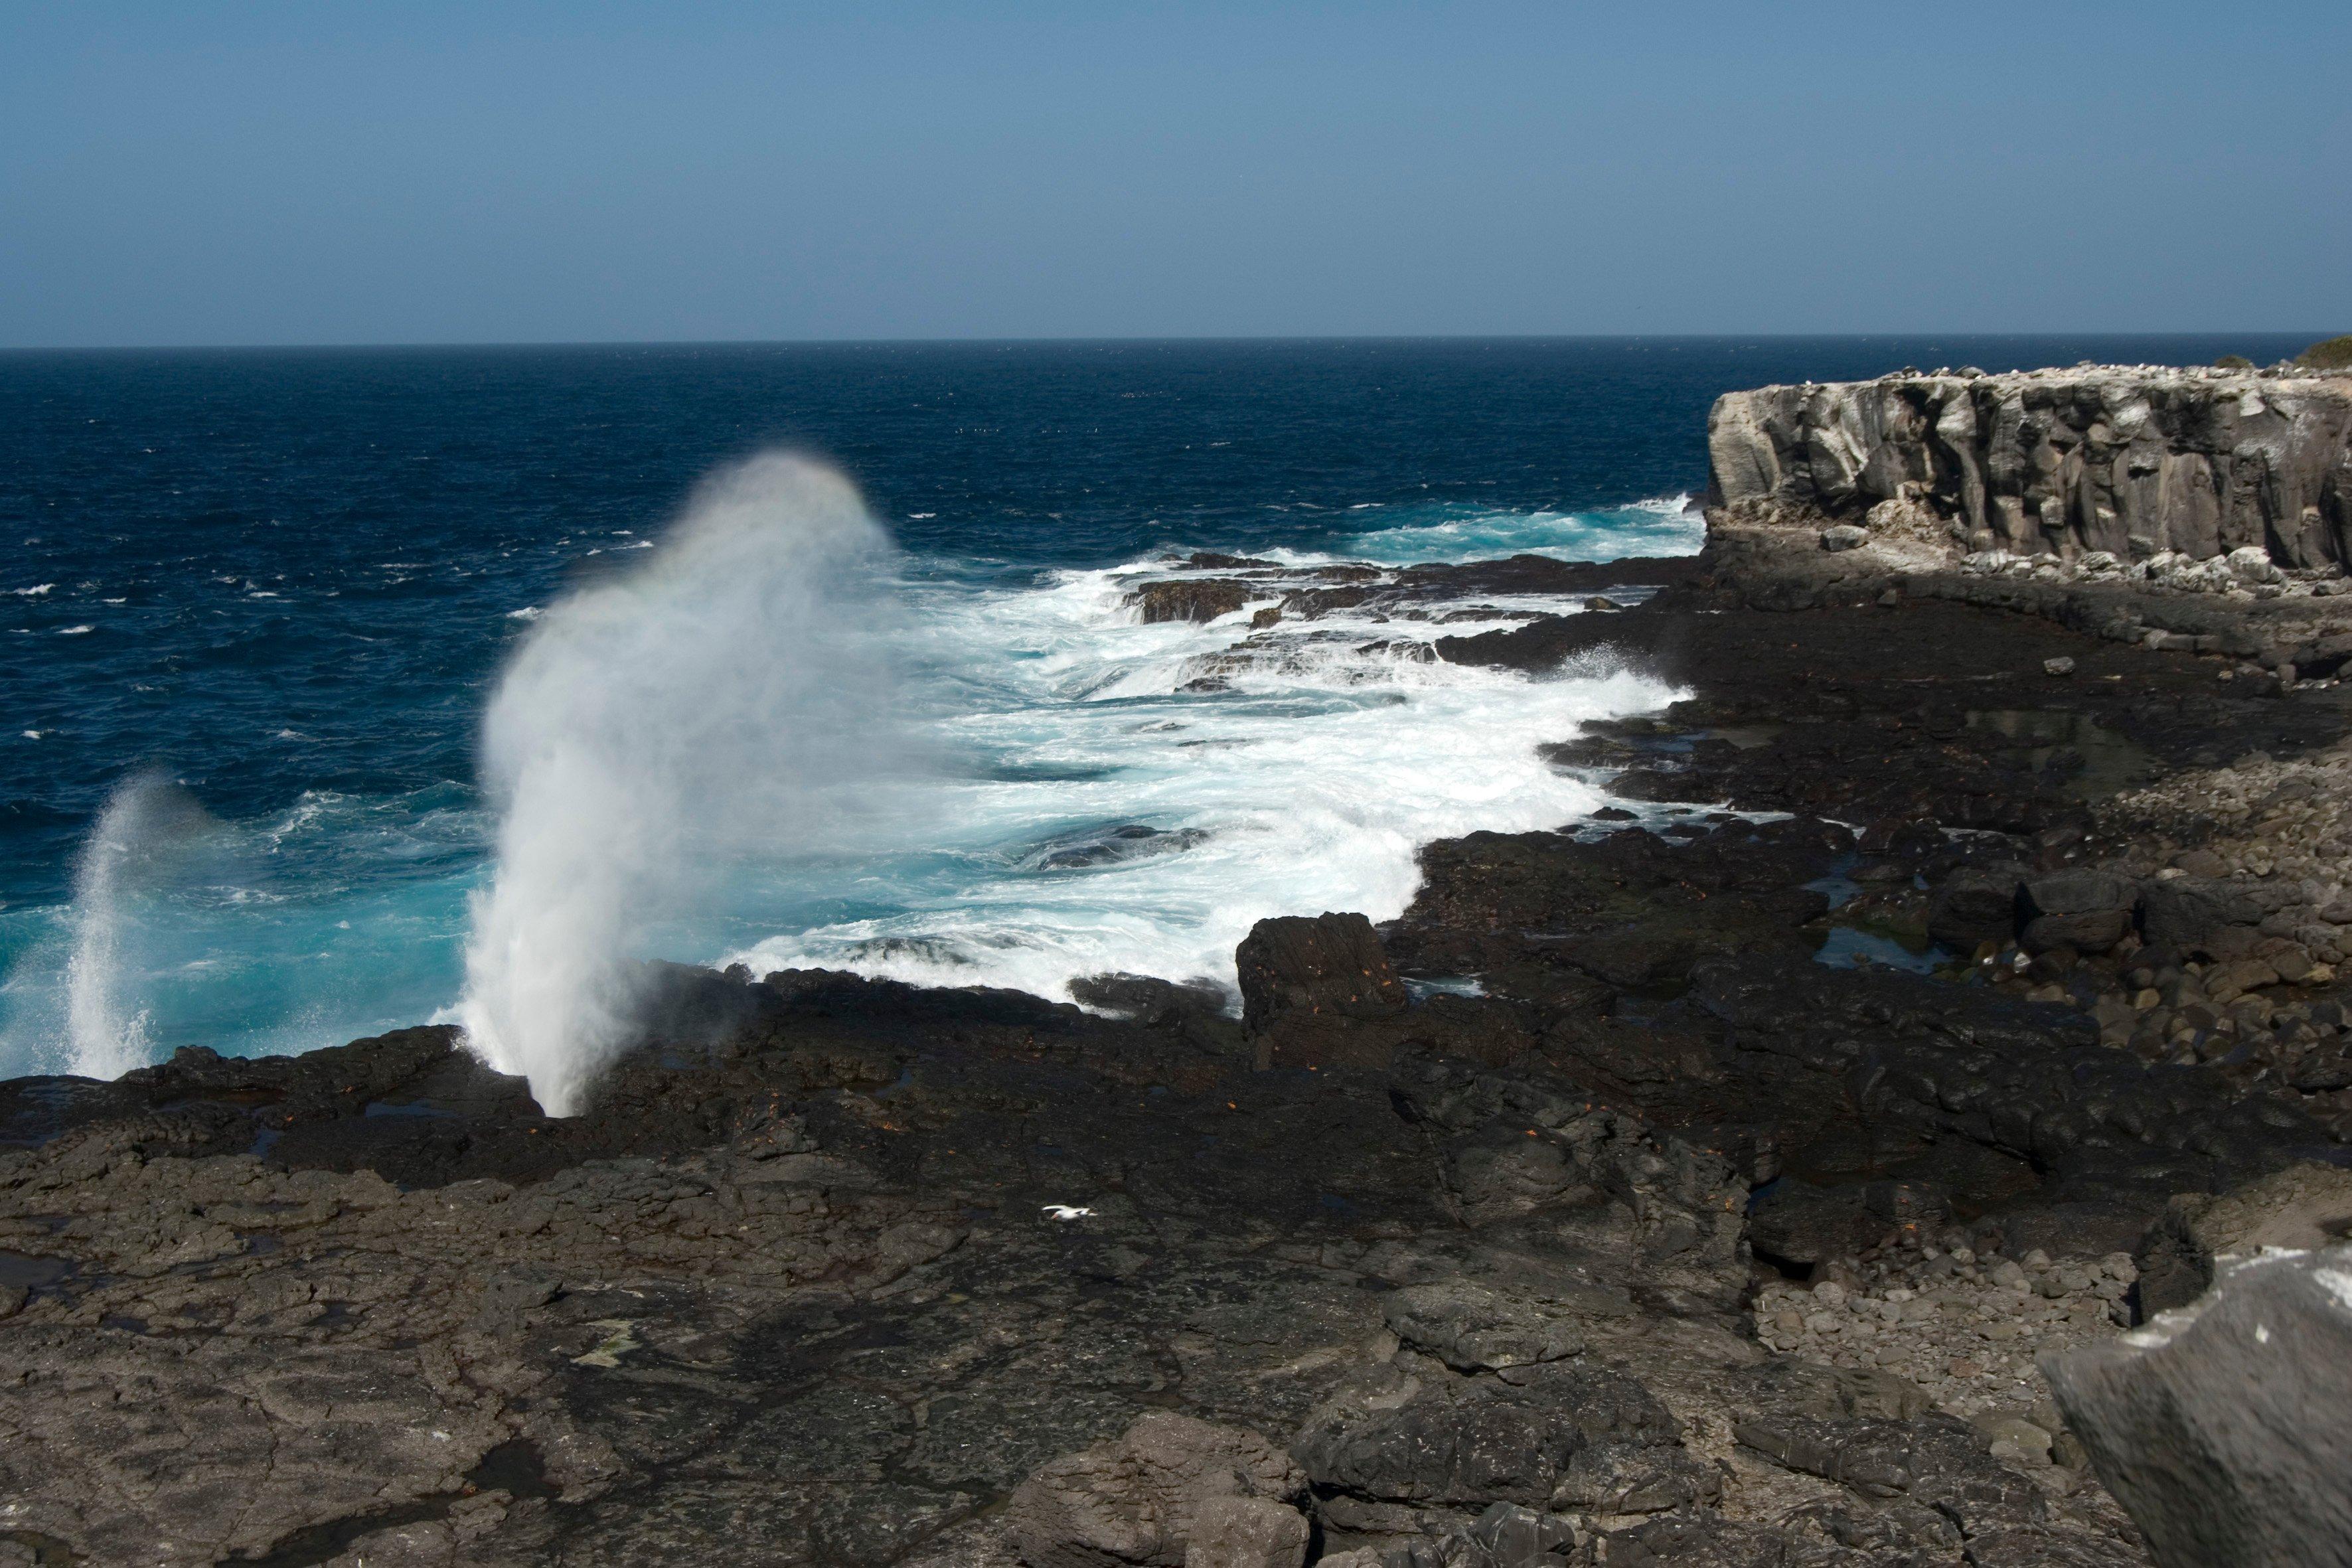 galapagos_ktpartners_española island shore